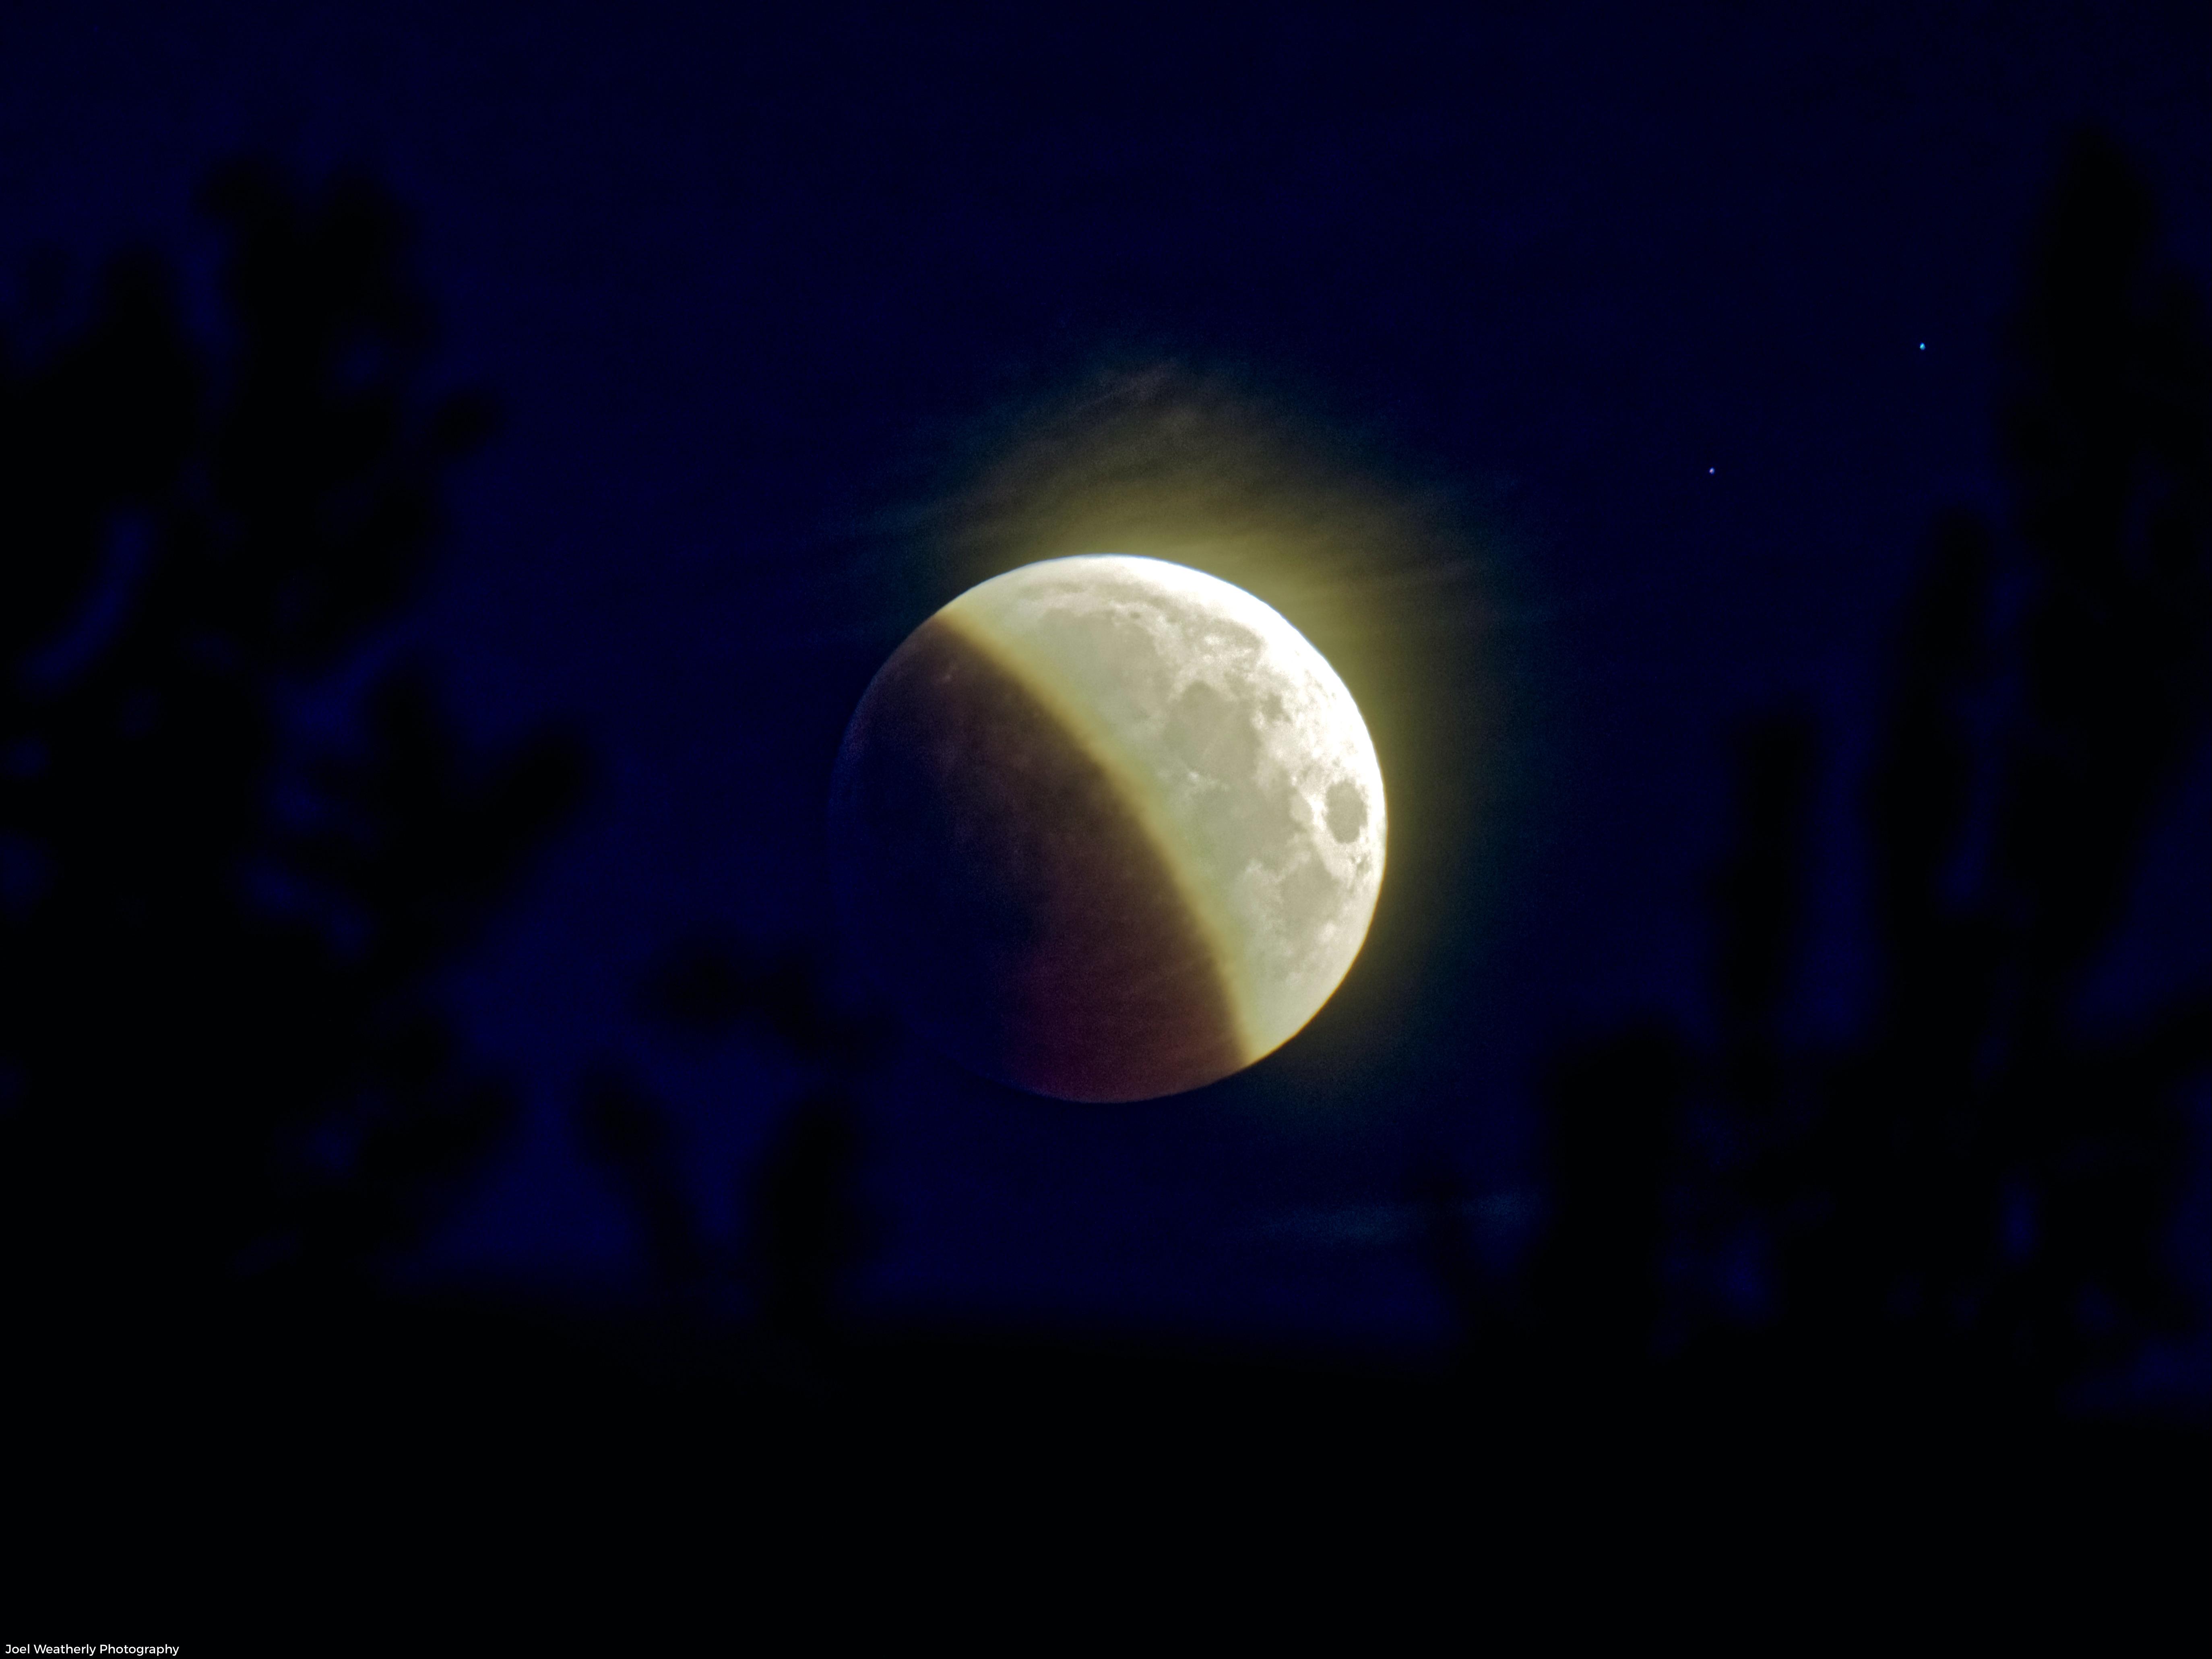 May 26, 2021 Lunar Eclipse